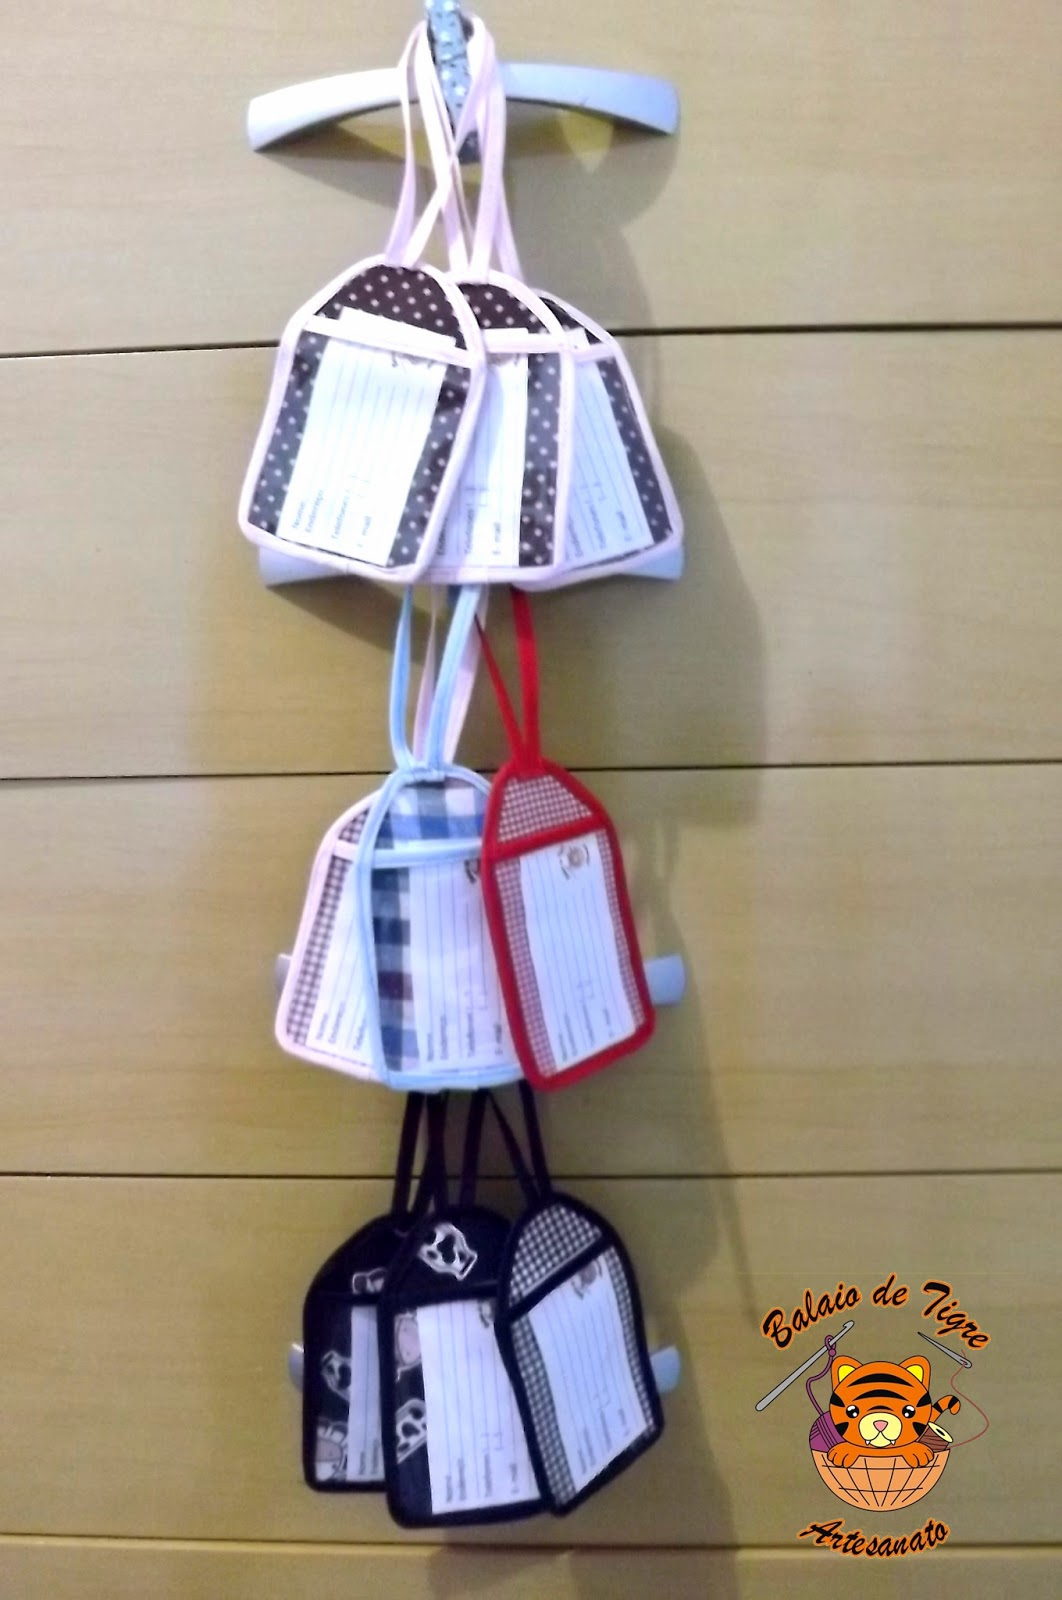 tag etiqueta mala bagagem balaio de tigre artesanato